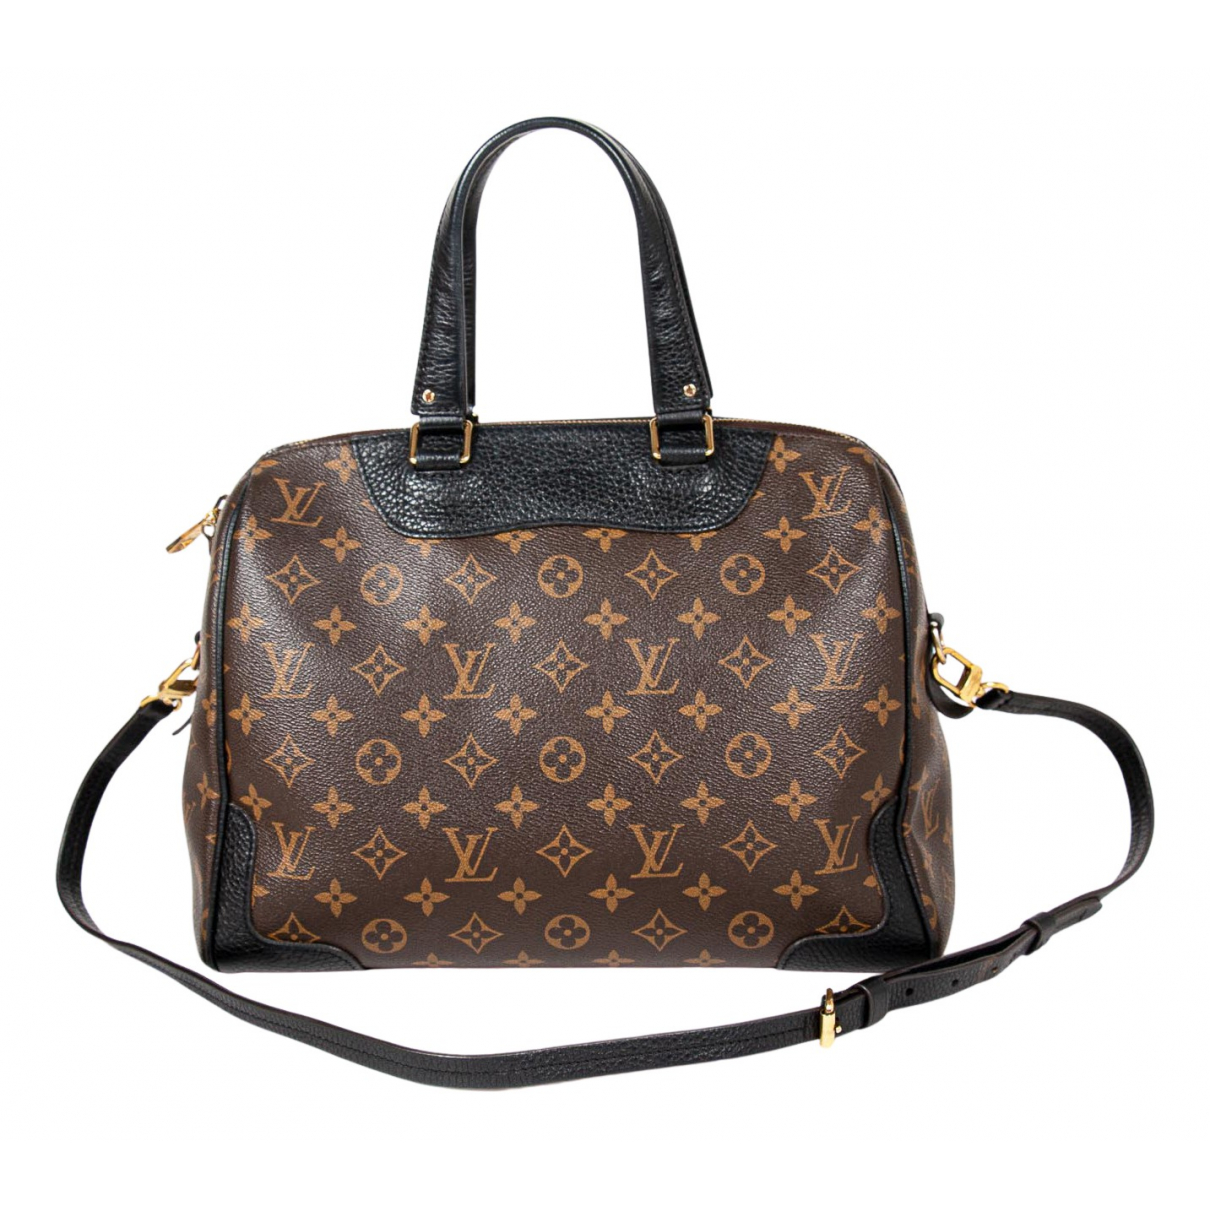 Bandolera Retiro PM de Lona Louis Vuitton